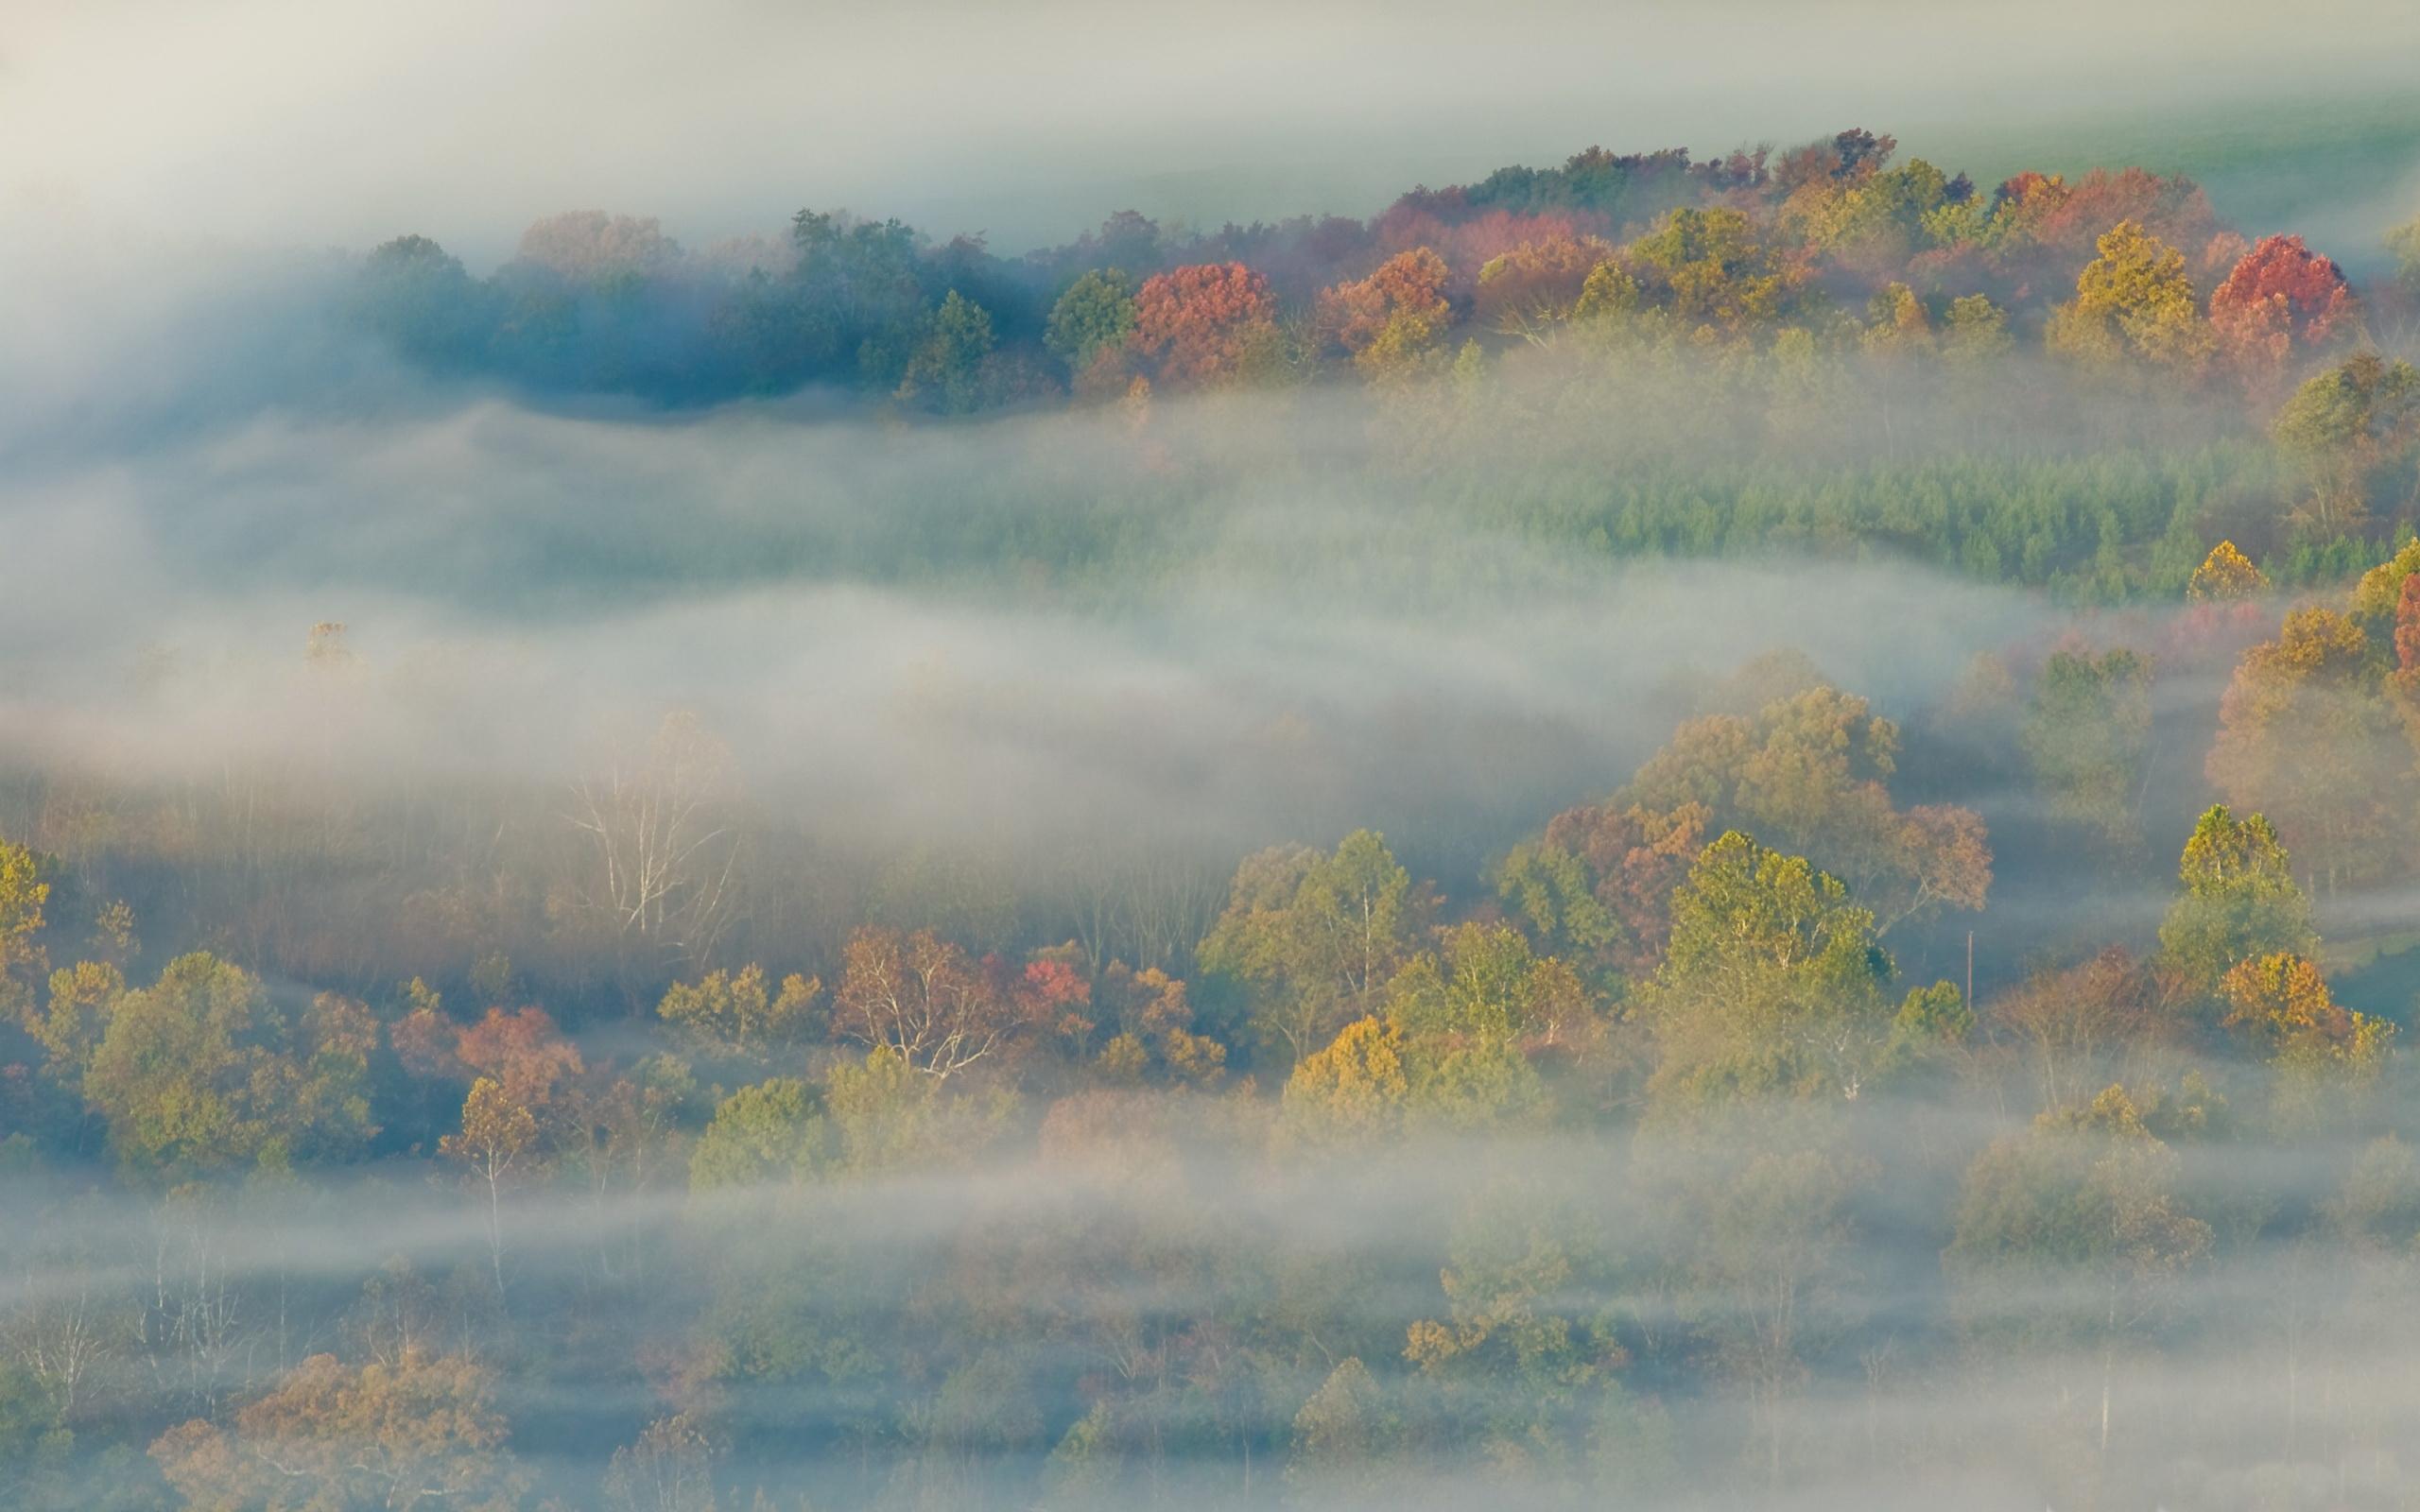 autumn_mist-wallpaper-2560x1600.jpg